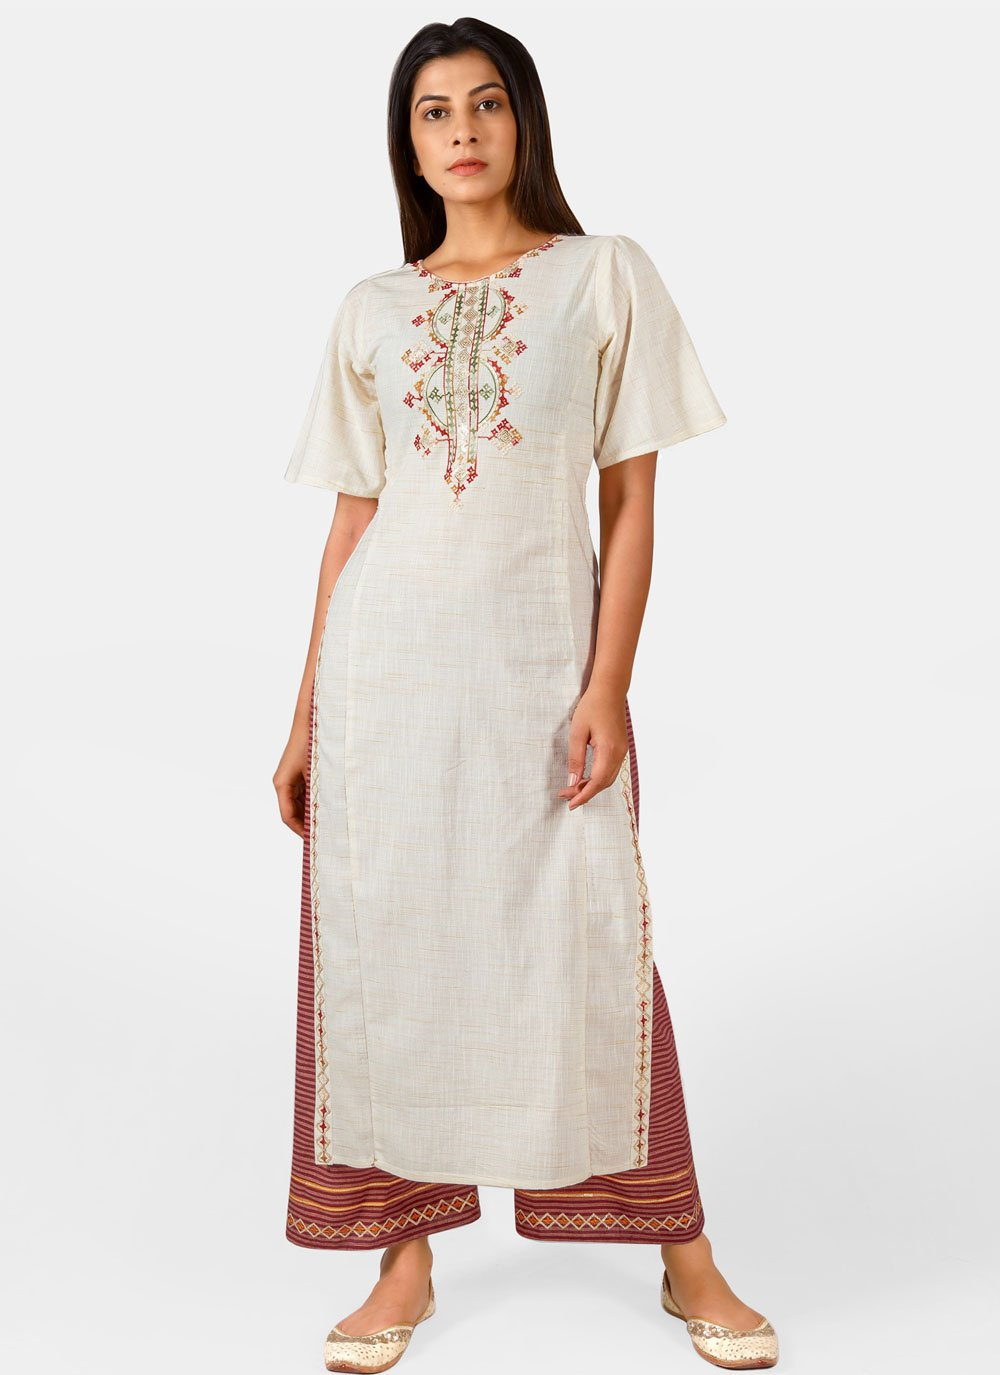 Off White Embroidered Khadi Party Wear Kurti